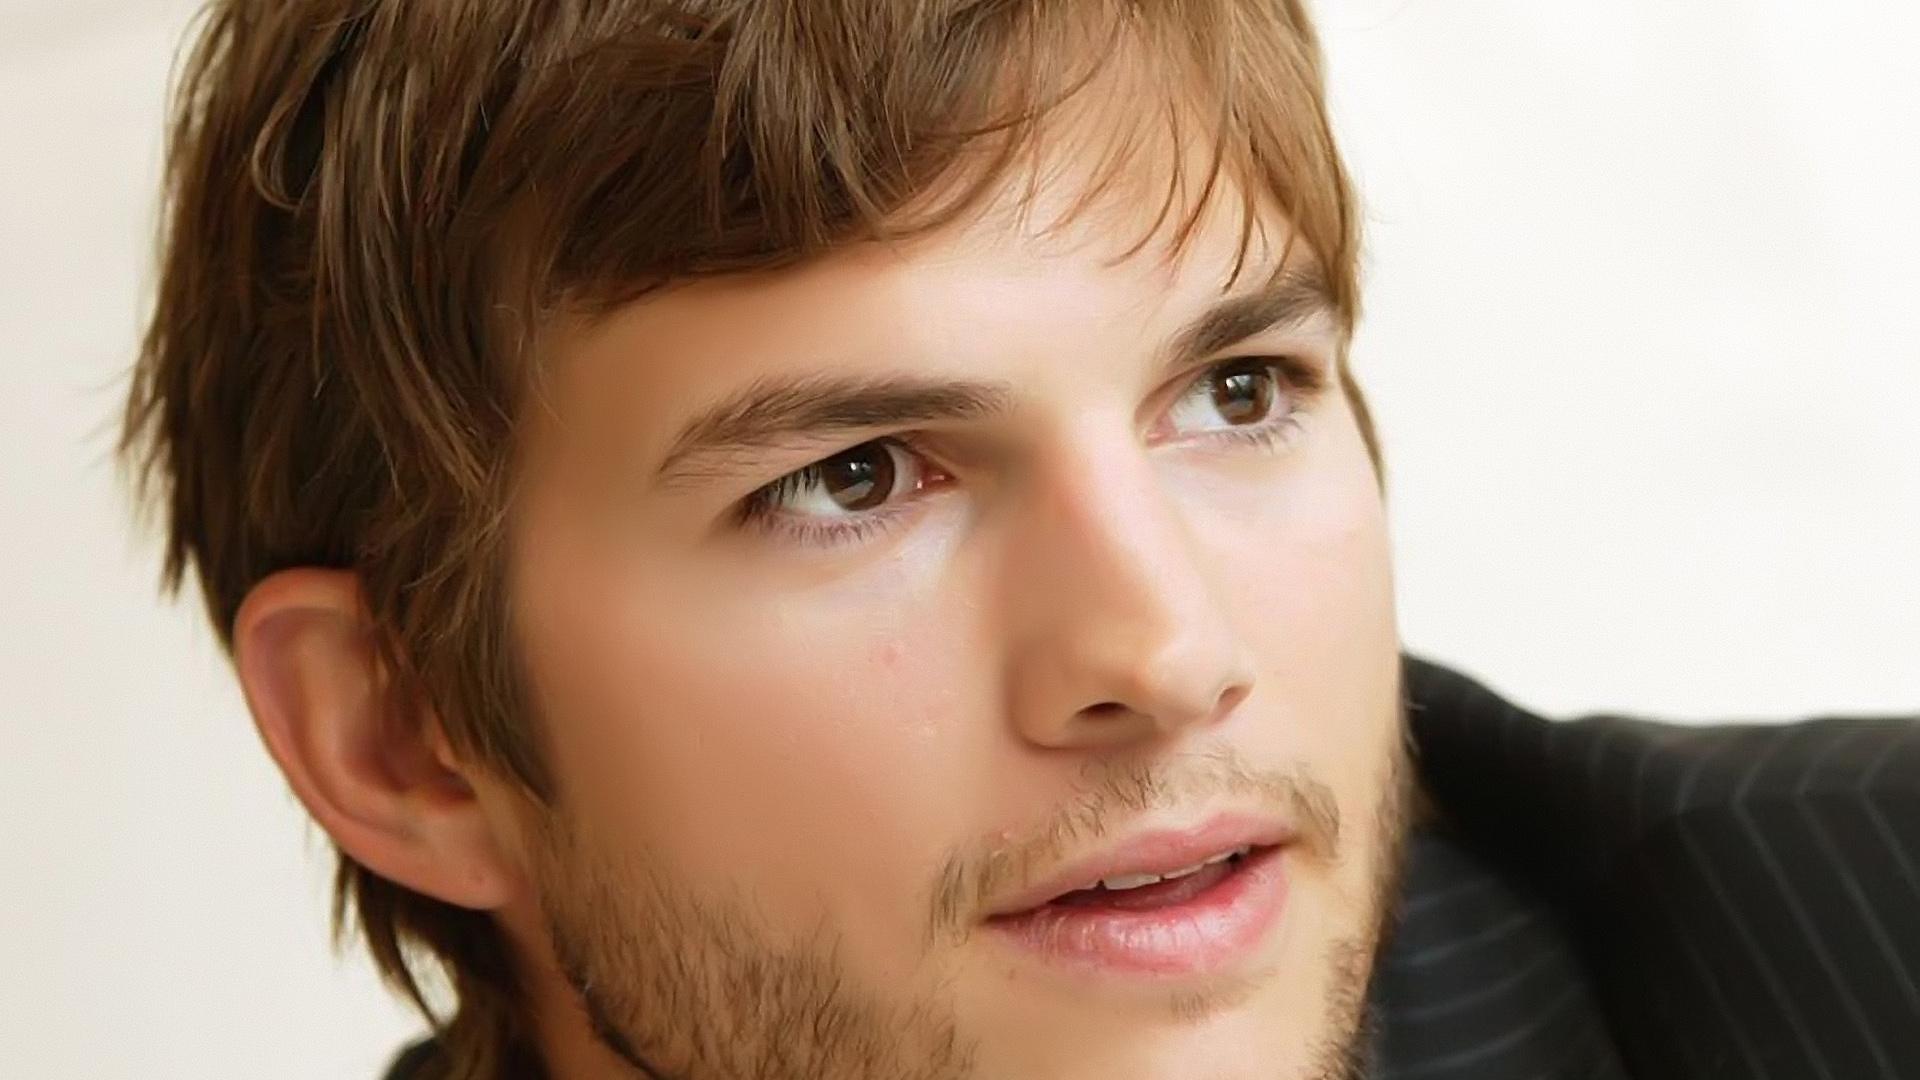 http://3.bp.blogspot.com/-zYSKfNKR33Y/UD7ywcOMJaI/AAAAAAAAIDM/3A74nXmKv0c/s0/ashton-kutcher-handsome-1920x1080-wallpaper.jpg